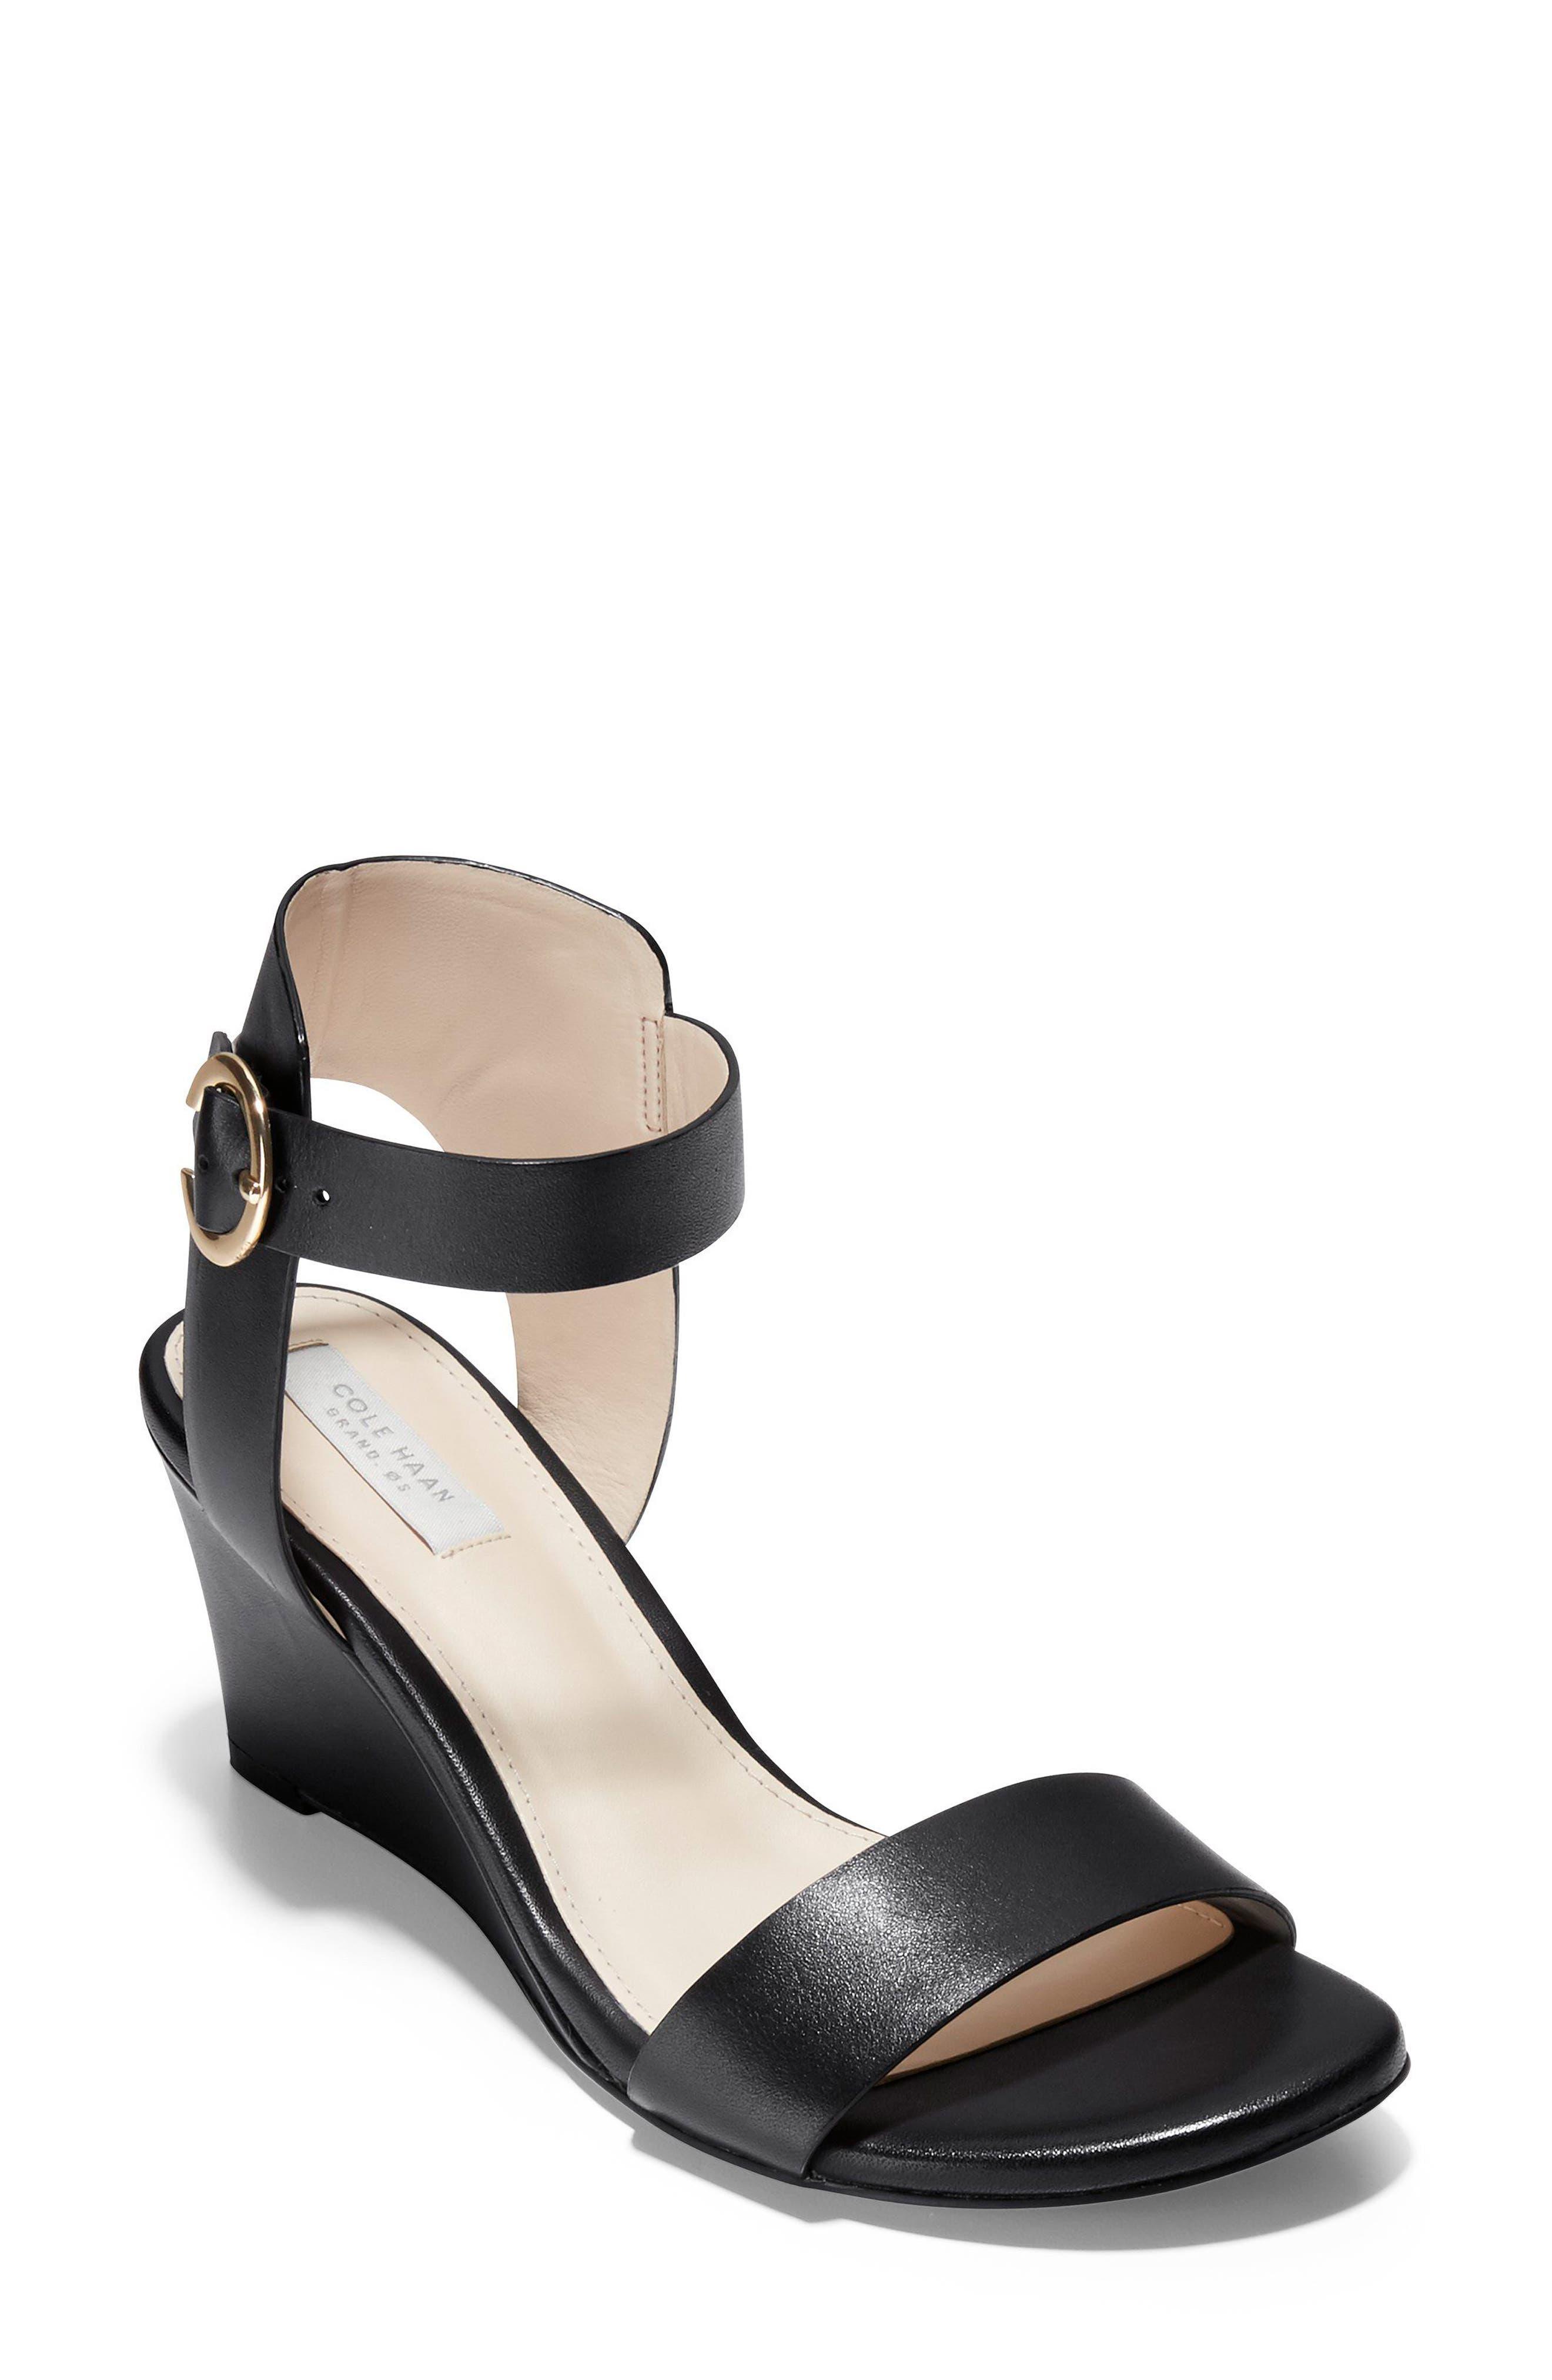 Rosalind Wedge Sandal,                             Main thumbnail 2, color,